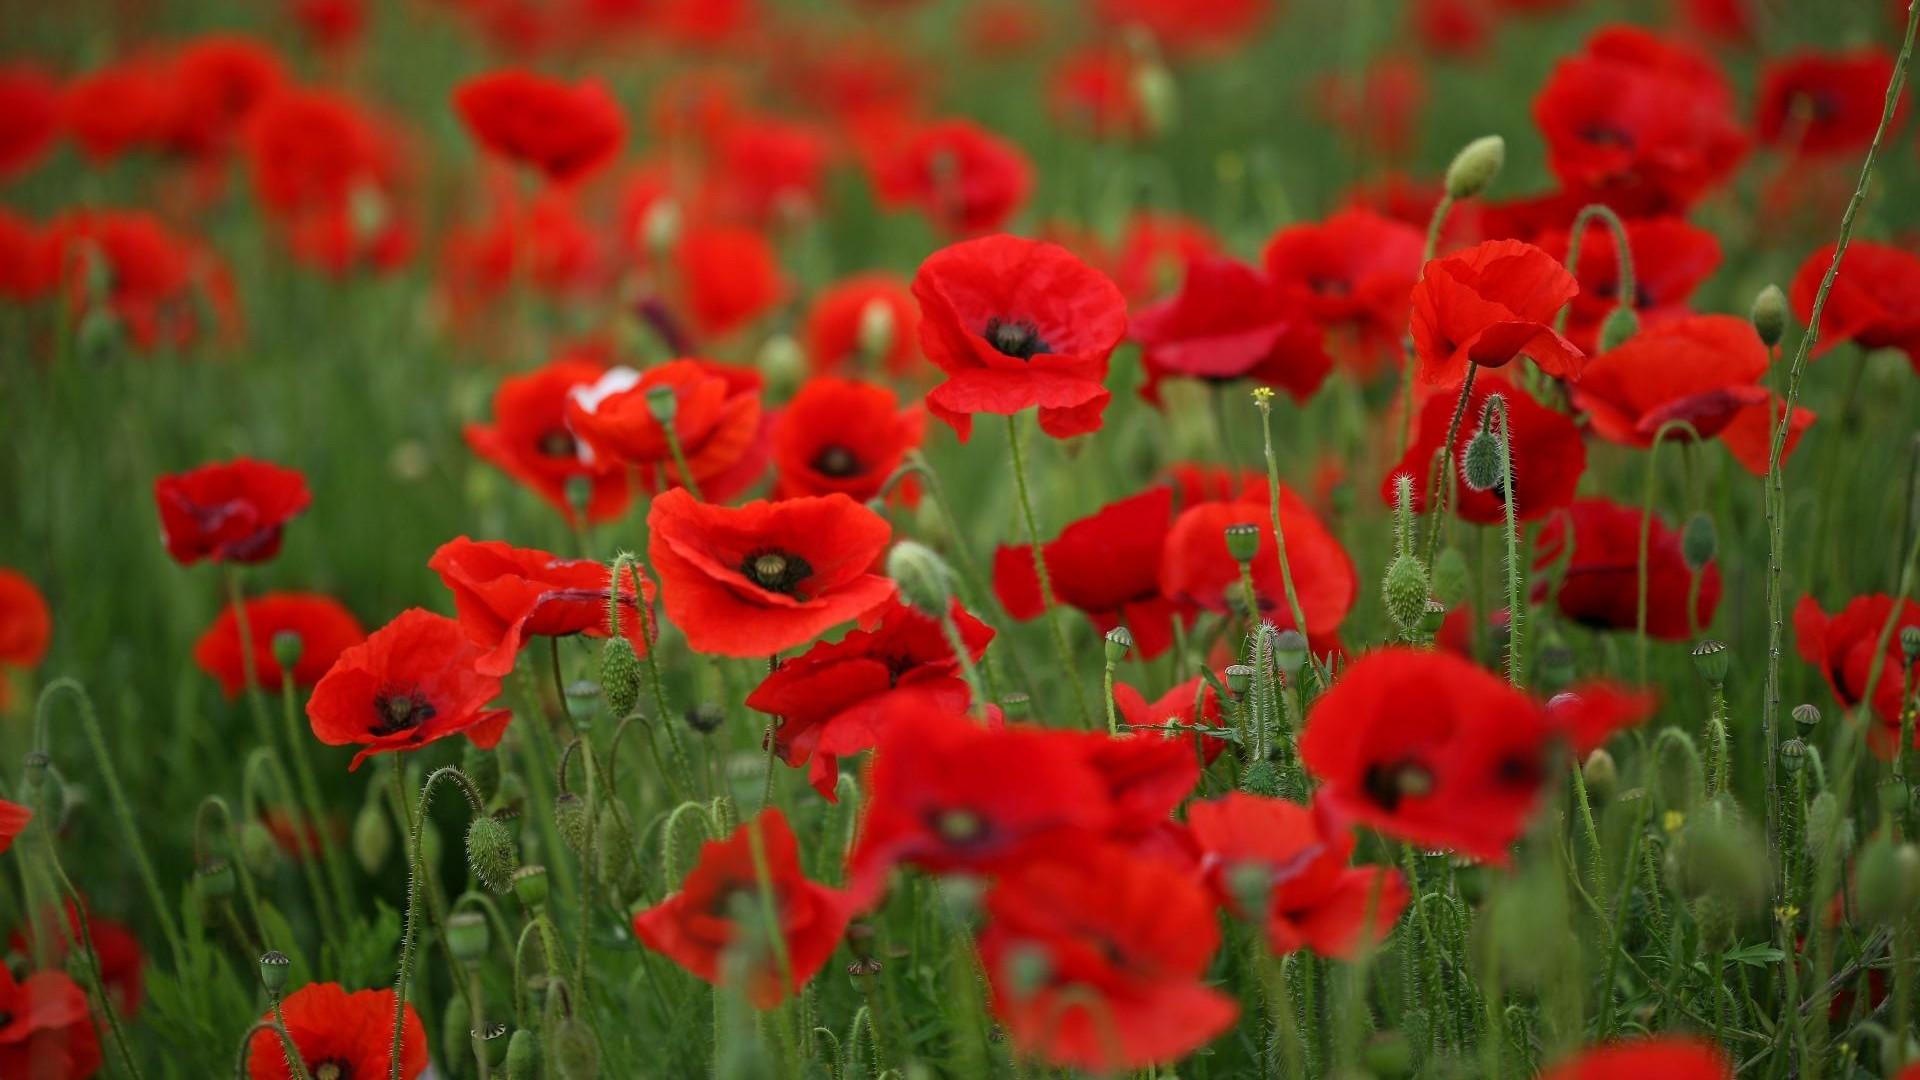 Field of Poppies wallpaper 1920x1080